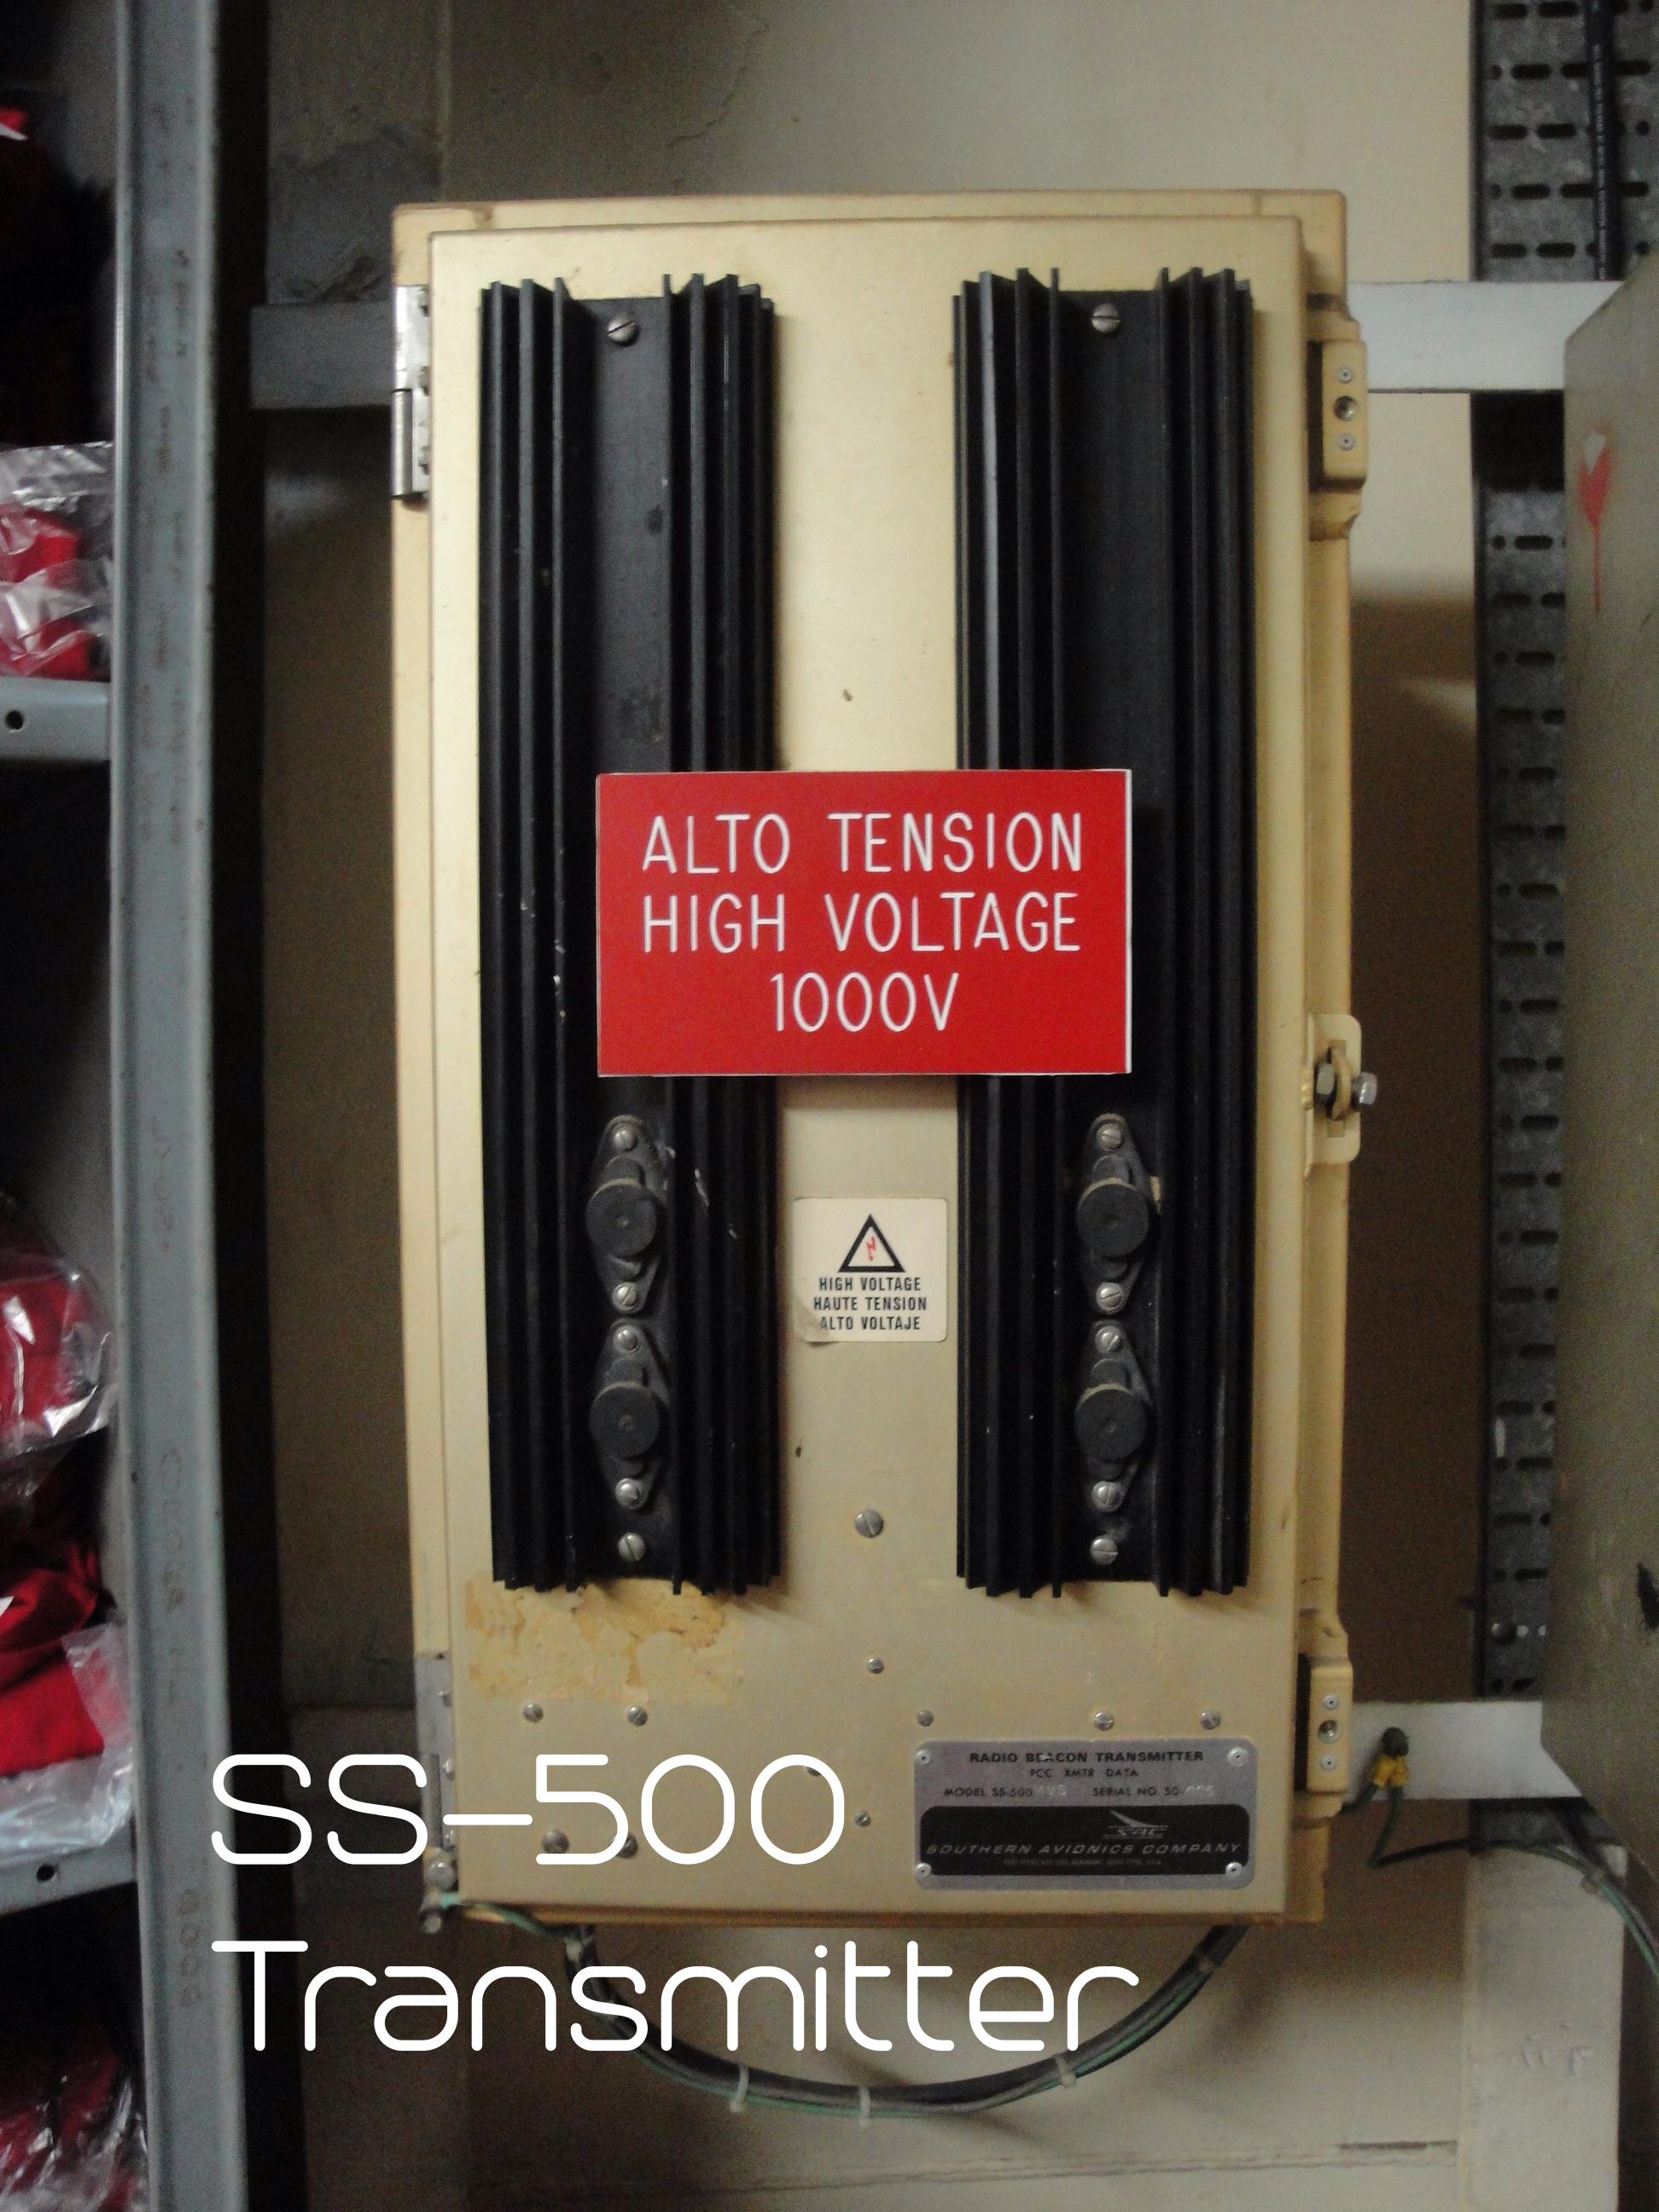 SS-500 NDB Transmitter